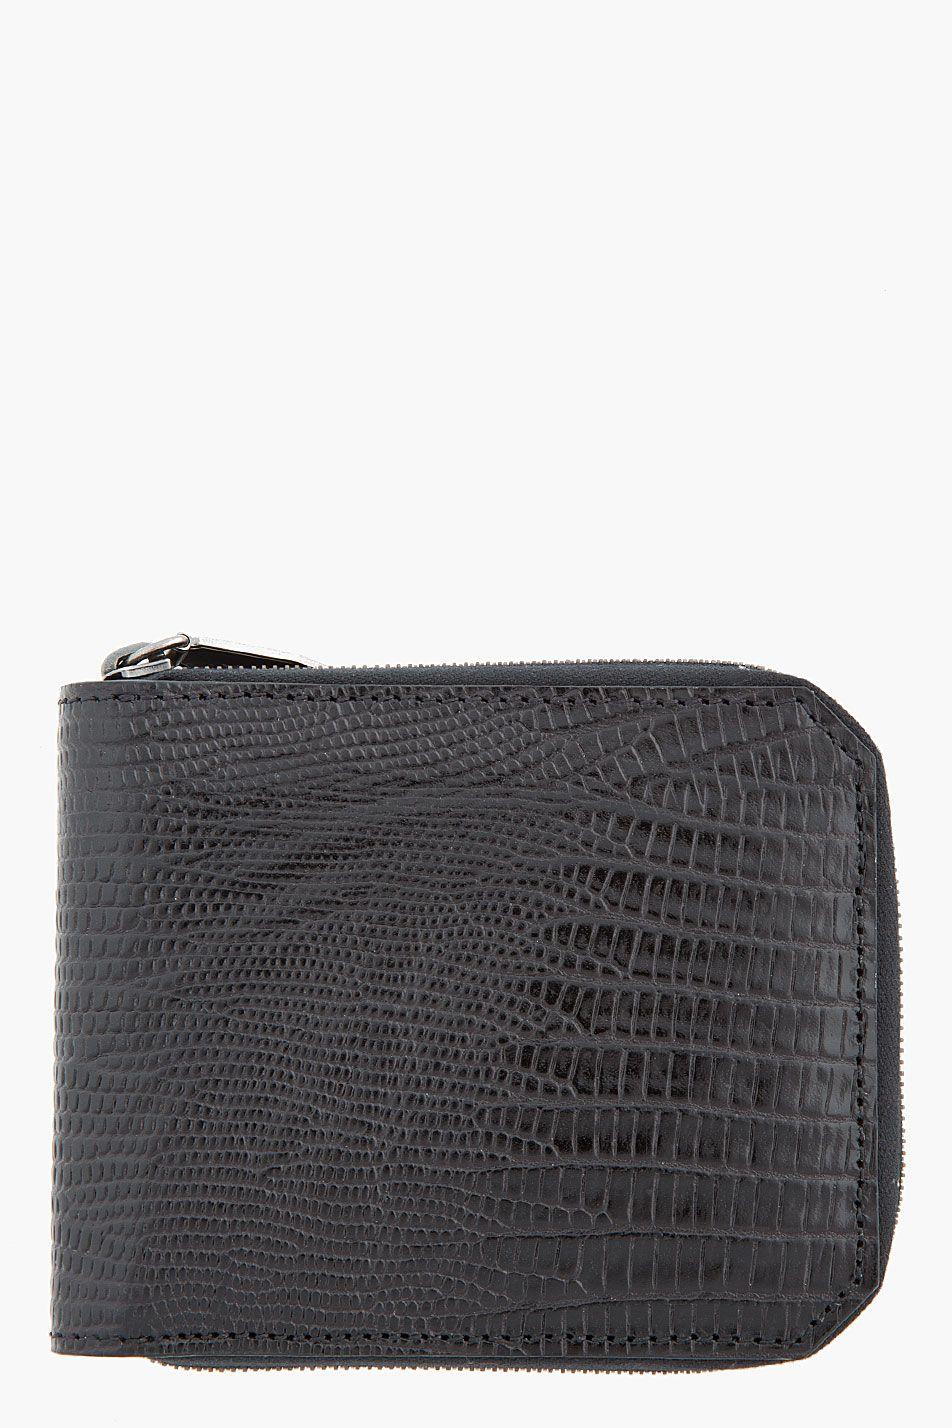 ALEXANDER WANG Black leather Printed Lizard Bi-Fold Wallet